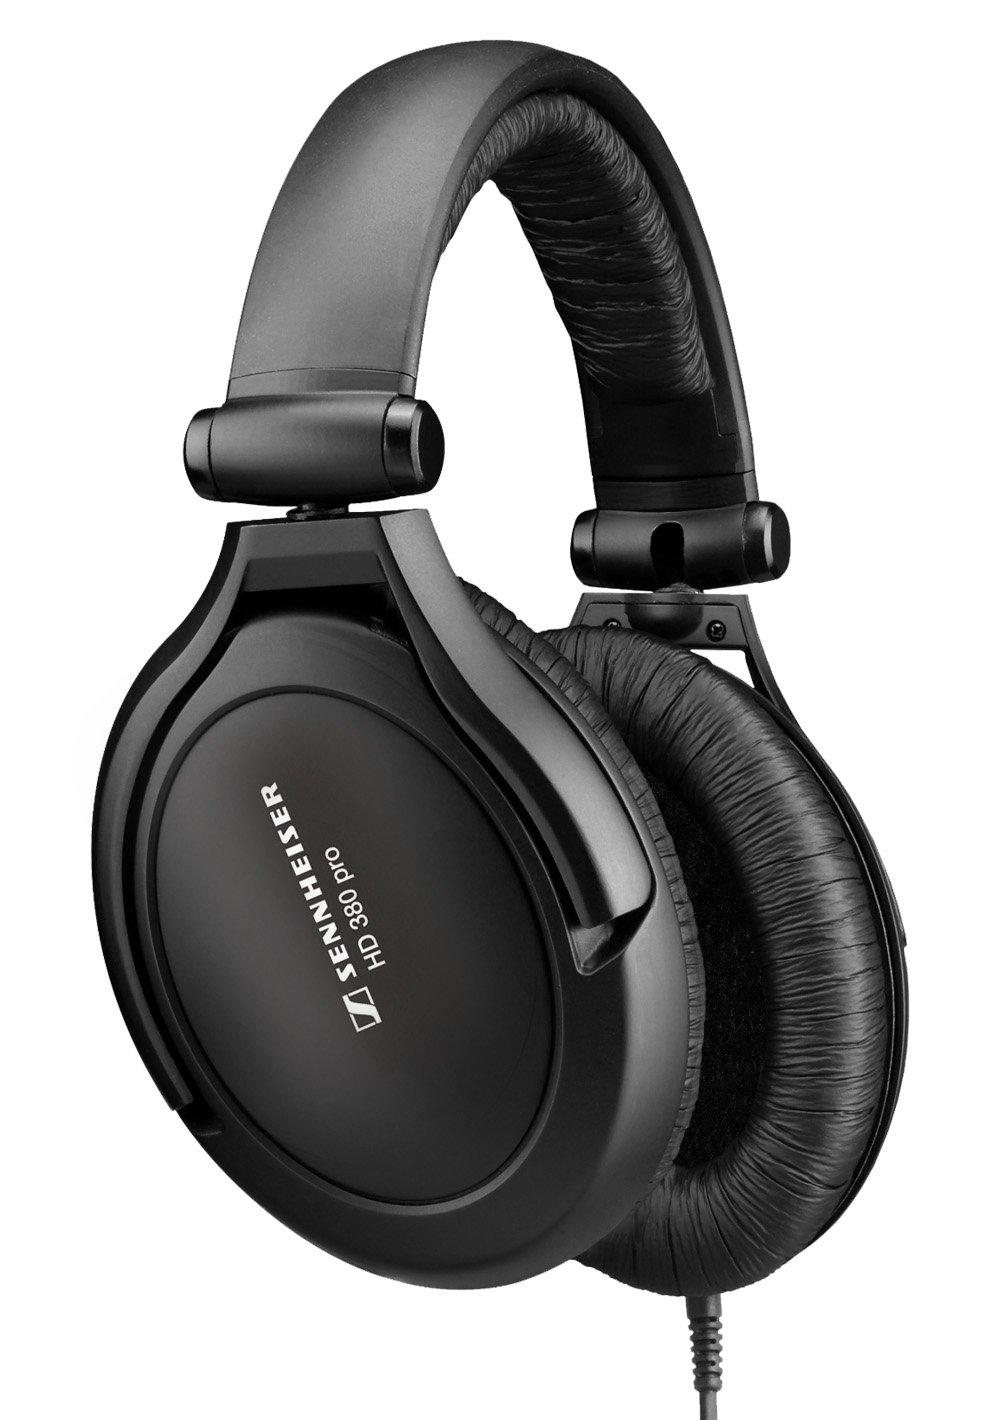 Sennheiser HD 380 PRO Headphones by Sennheiser